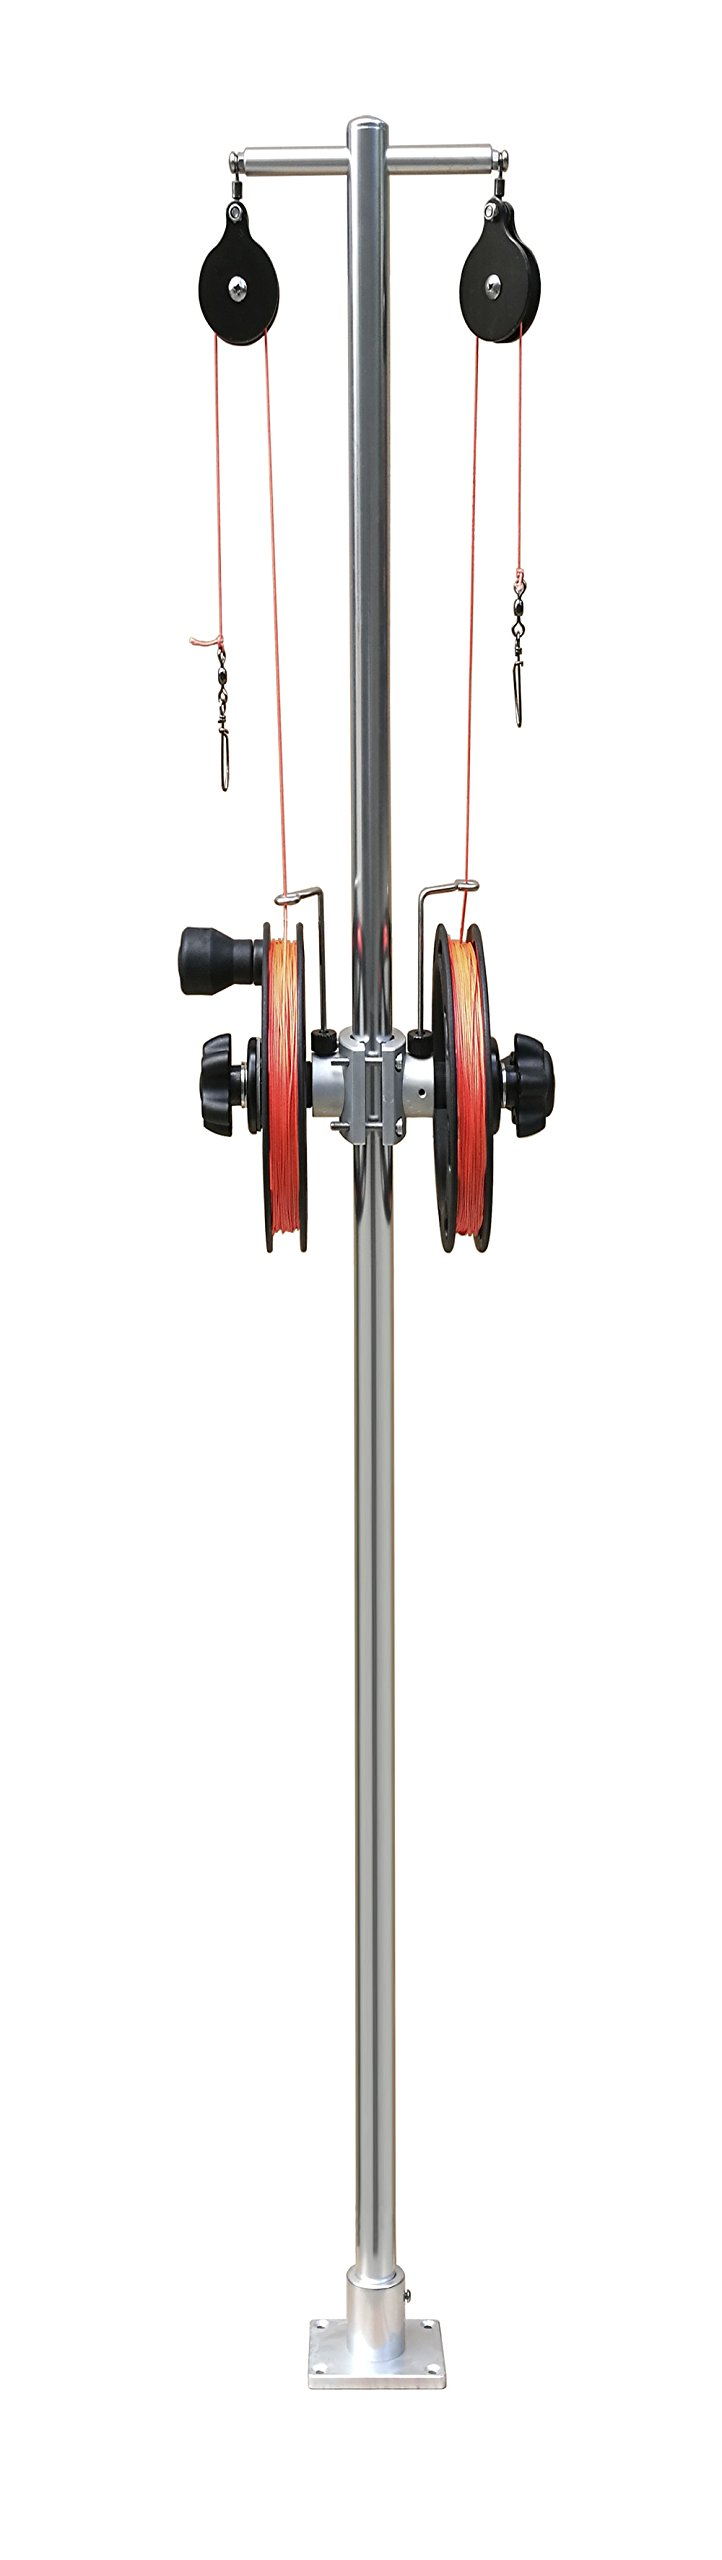 Brocraft Dual Reel Planer Board Mast System by Brocraft